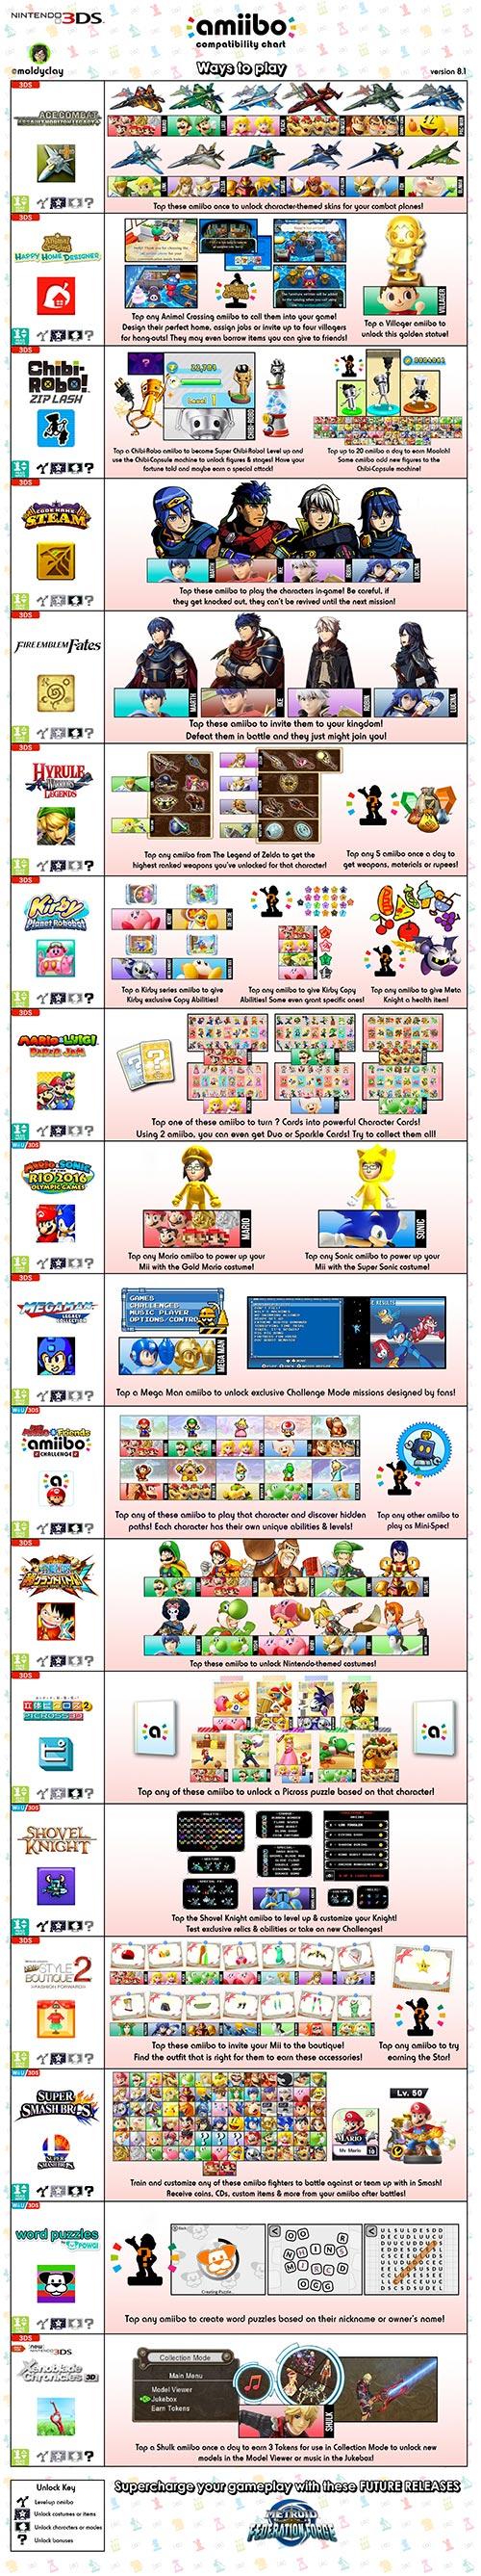 Amiibo Compatibility Chart Nintendo 3DS version 8.1